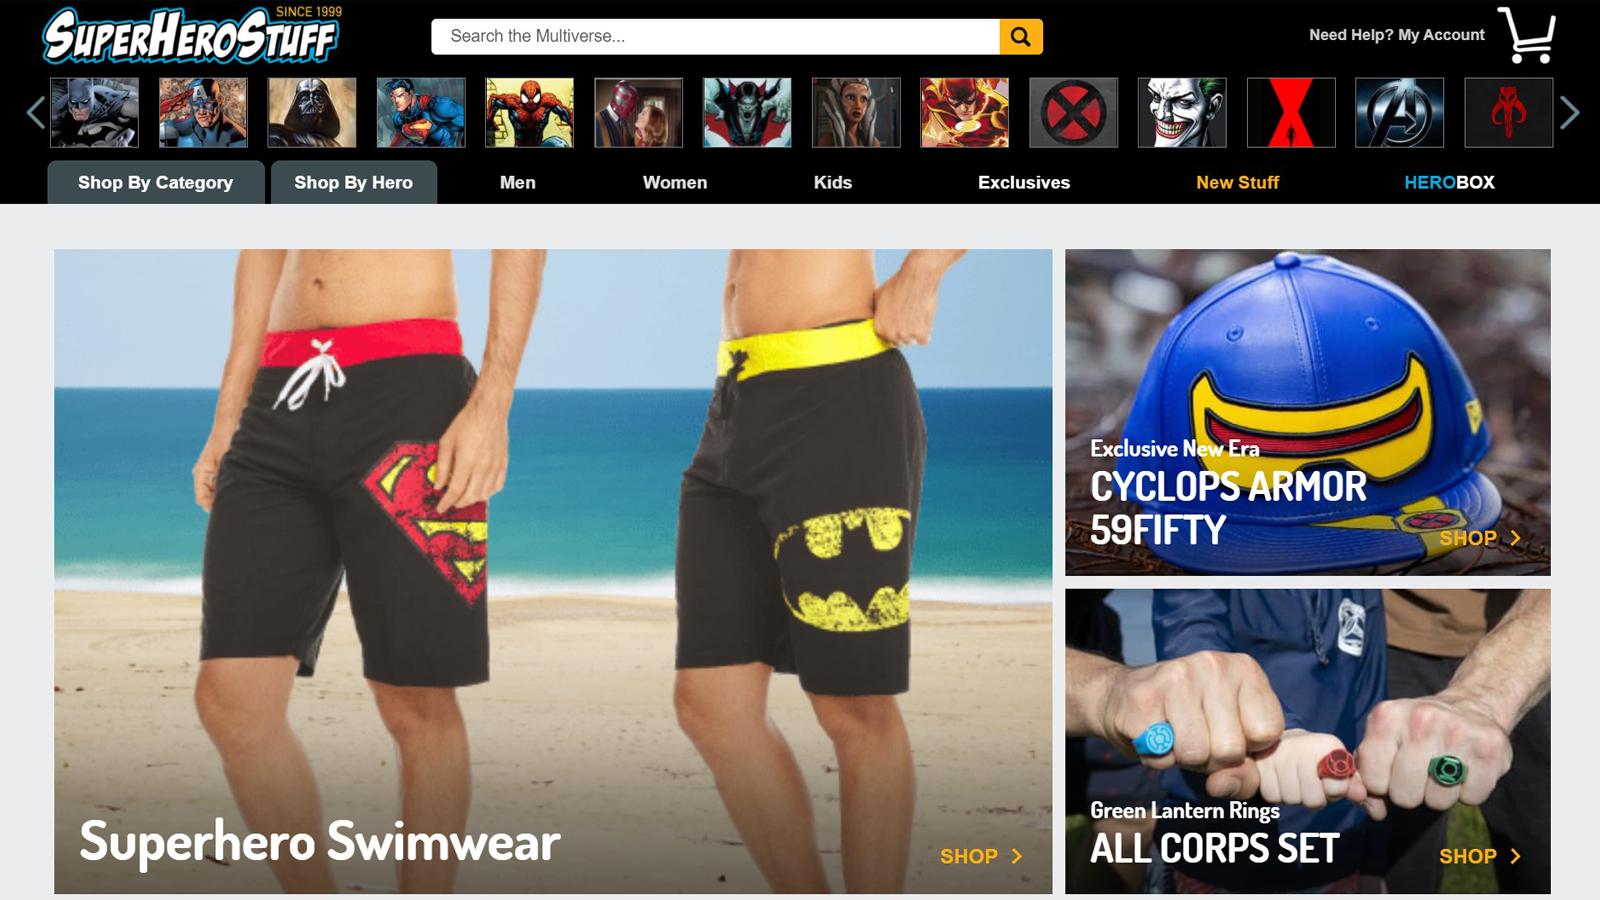 Lots of clothing, hats, jewelry, and other superhero-based options on Superhero STuff